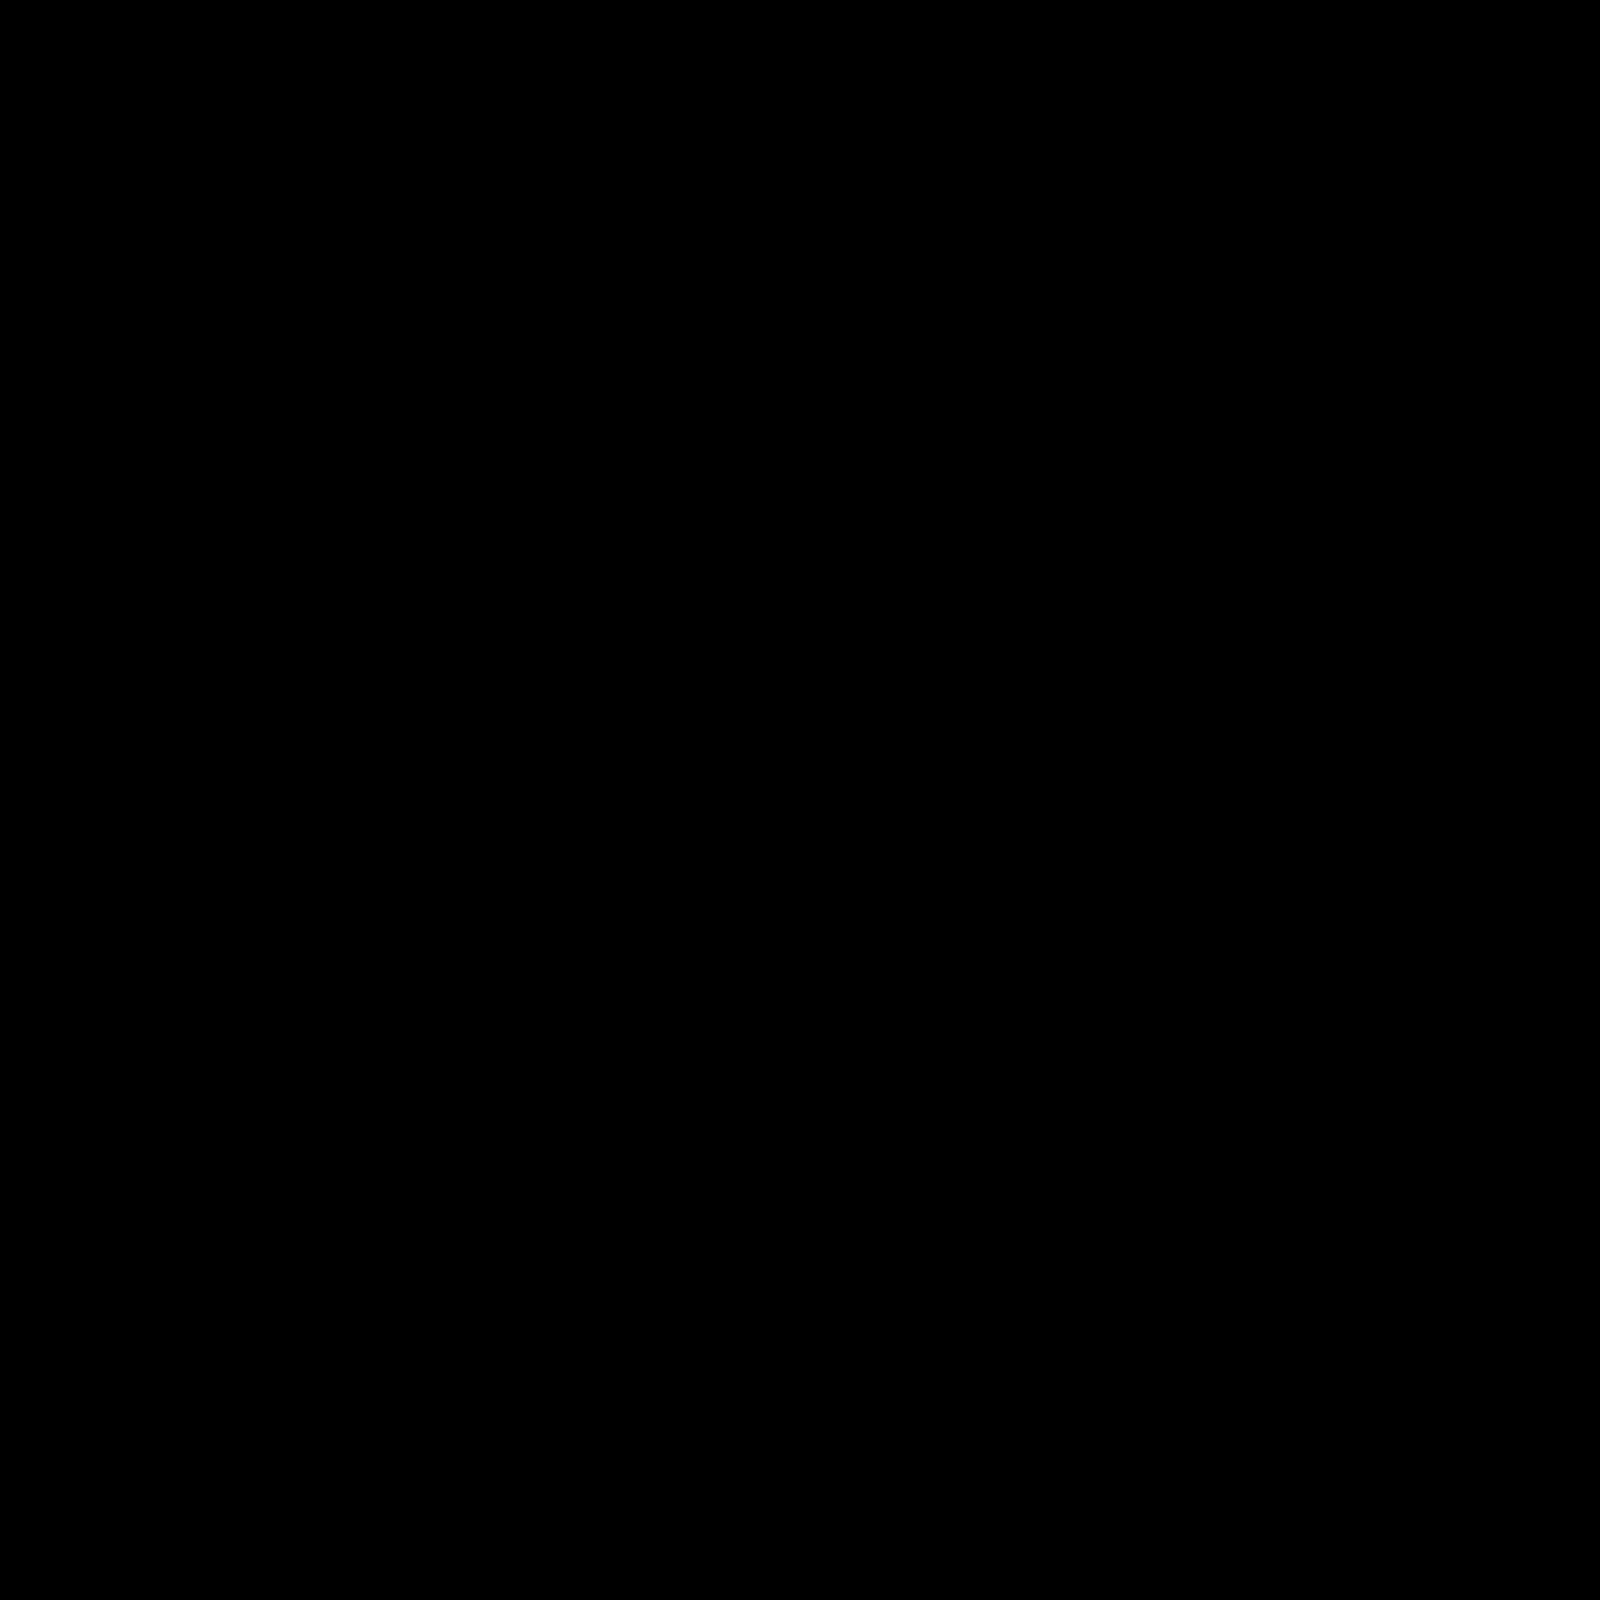 External Lights icon